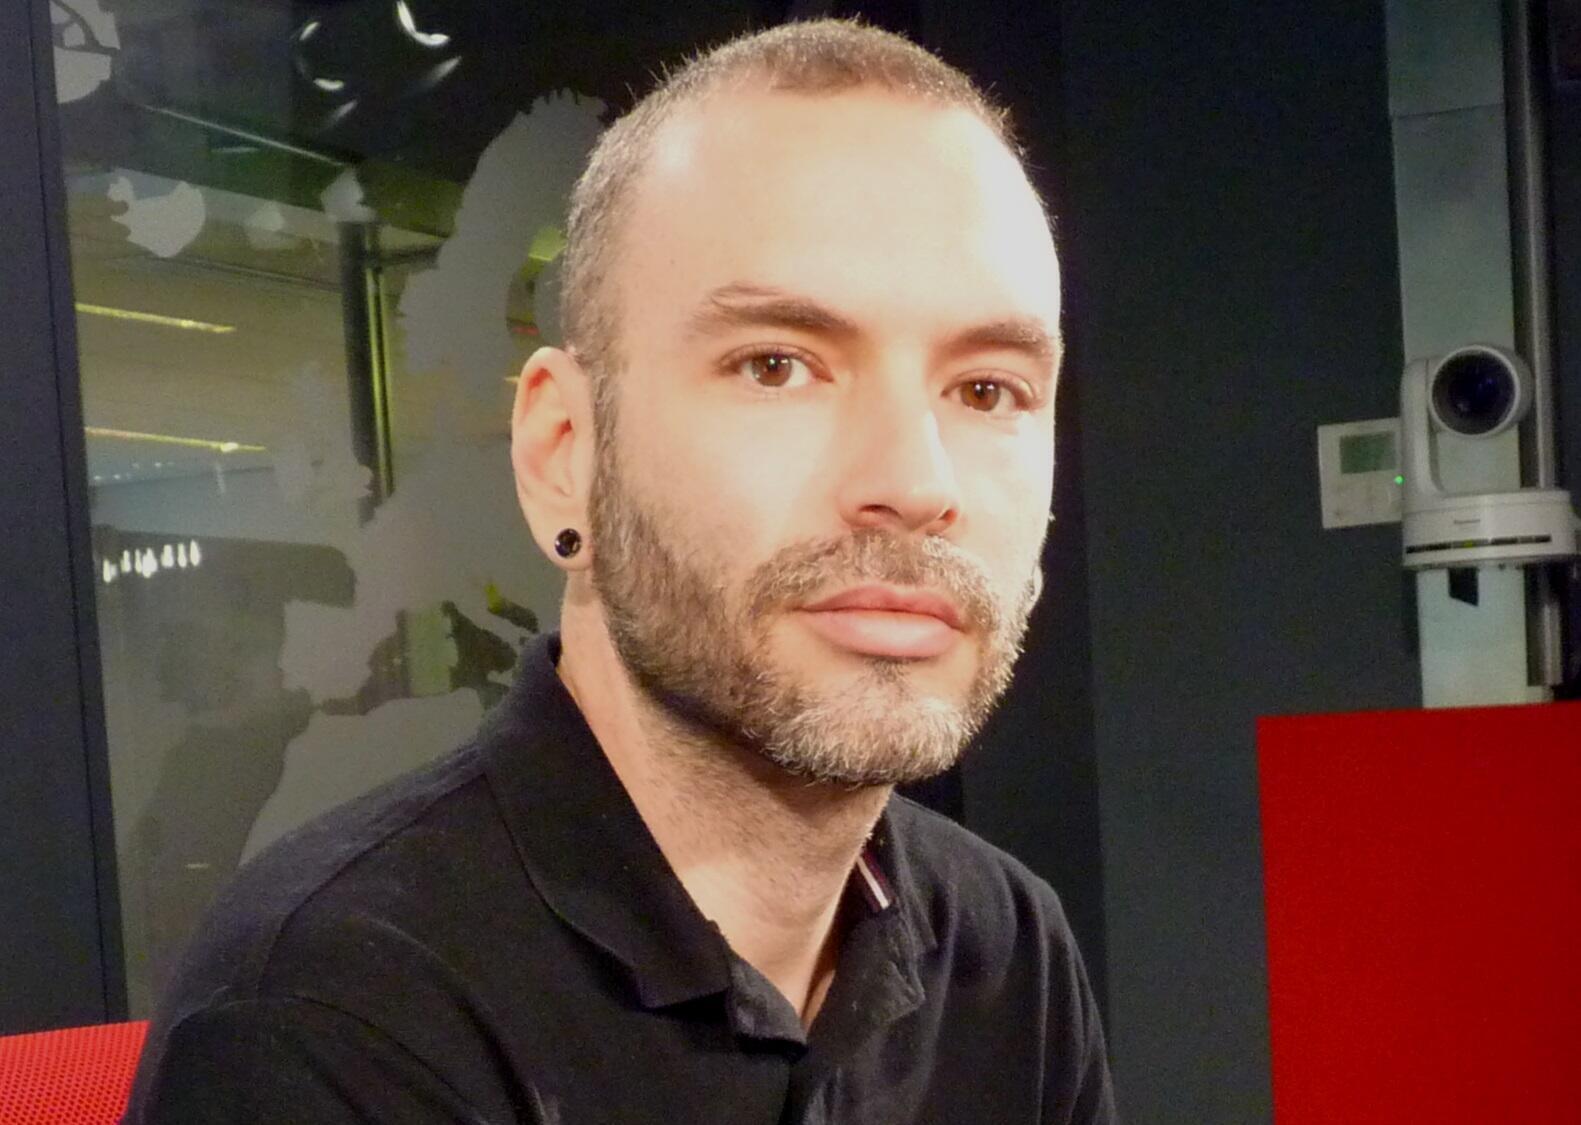 El artista venezolano Cristóbal Ochoa en RFI